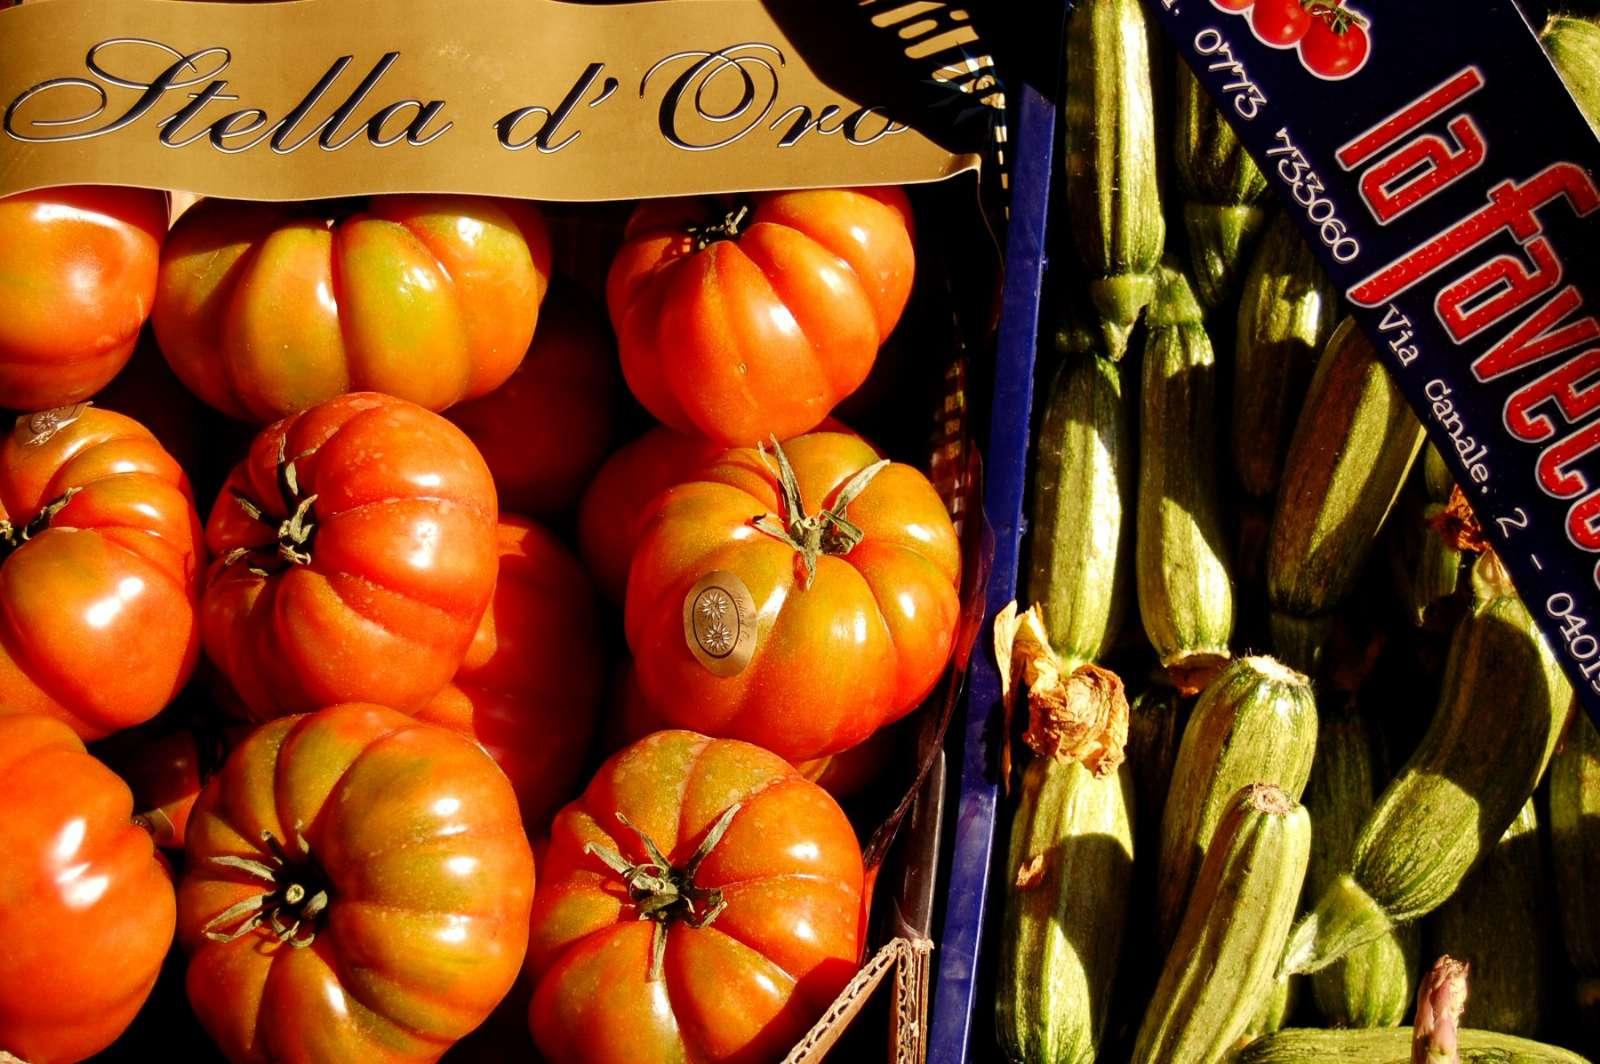 Solmogna grönsaker